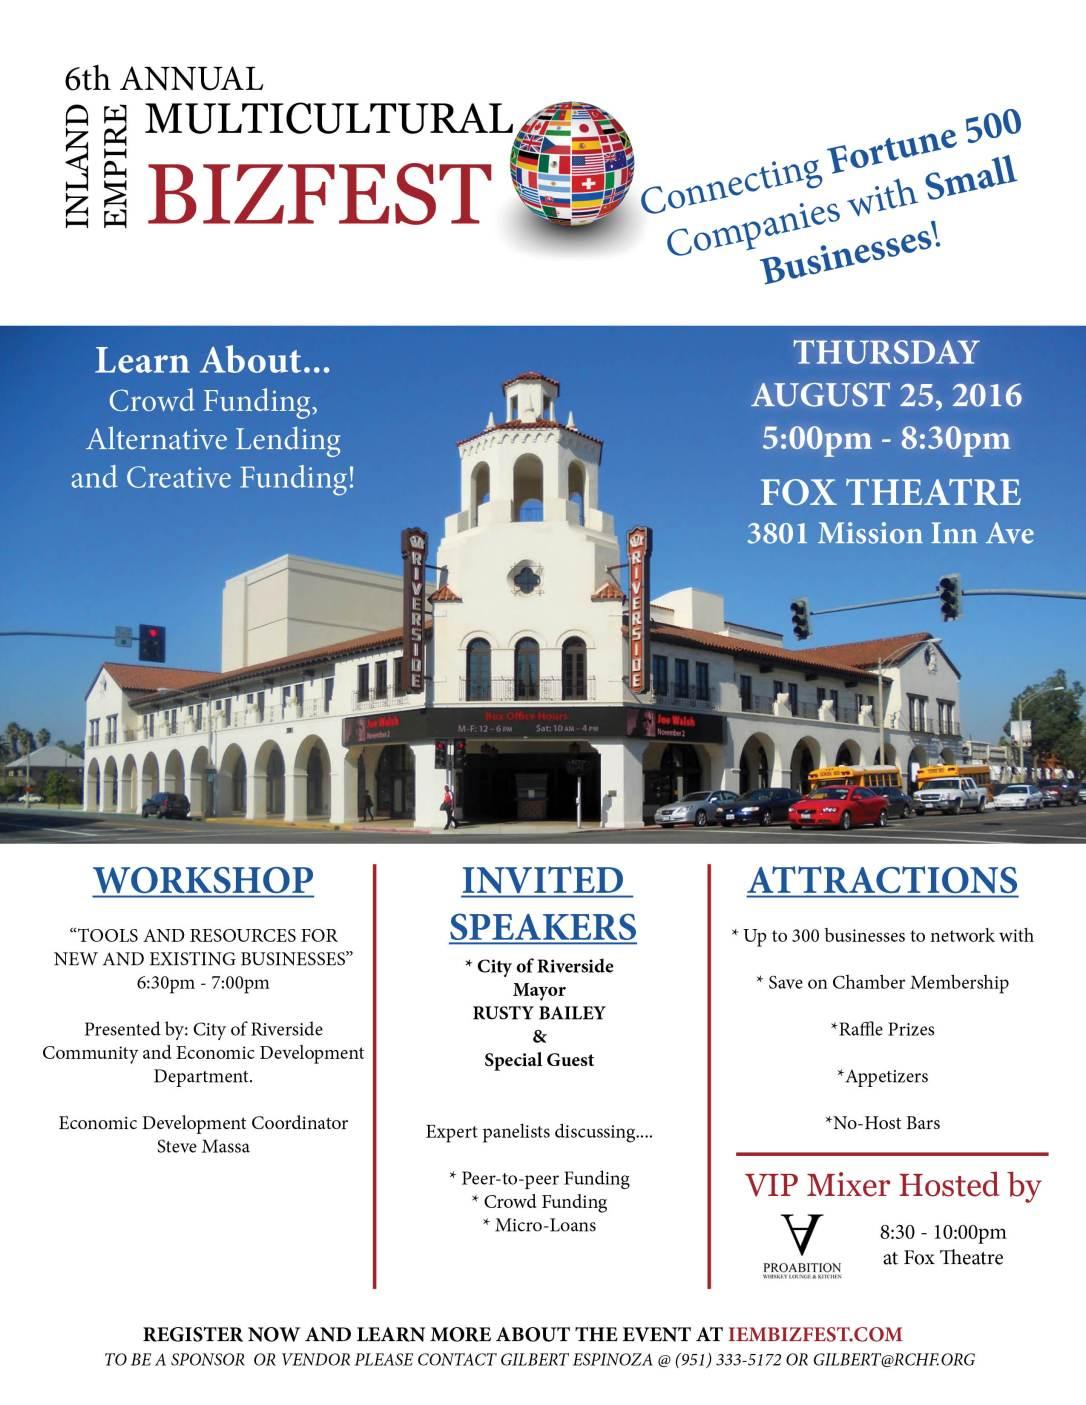 inland empire multicultural bizfest multicultural biz fest